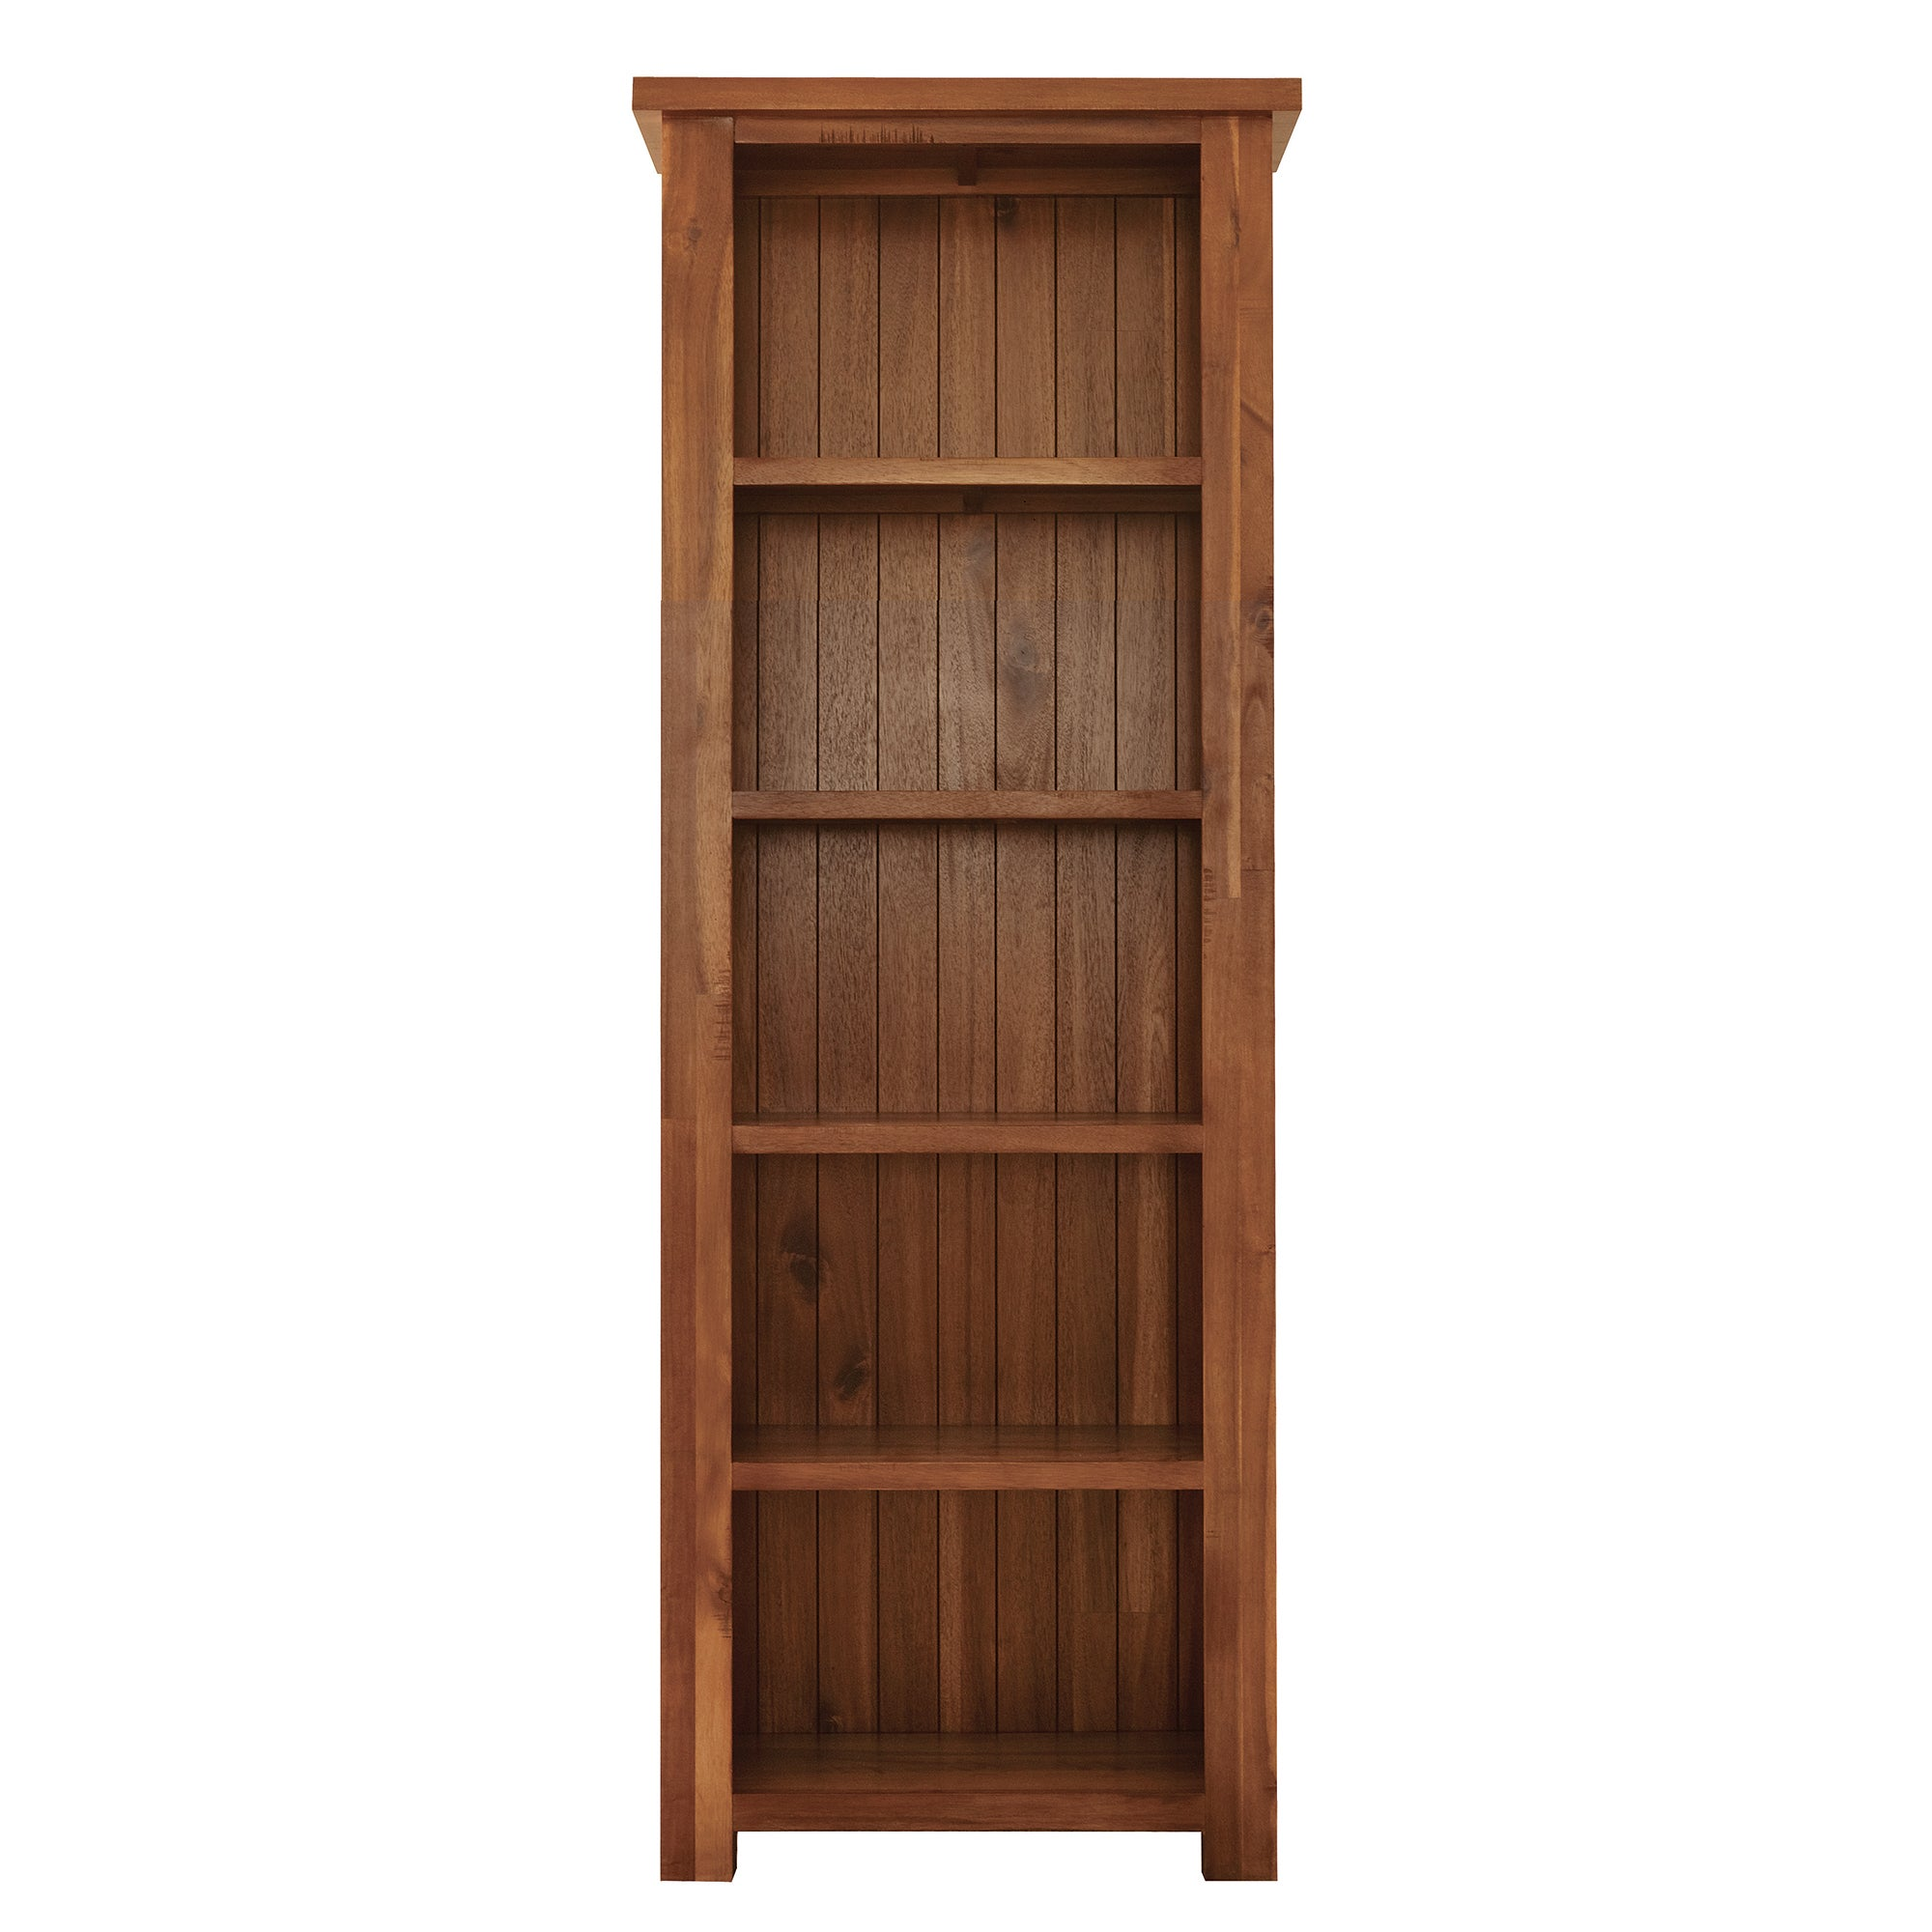 Buy Cheap Dark Wood Bookcase  Compare Furniture Prices